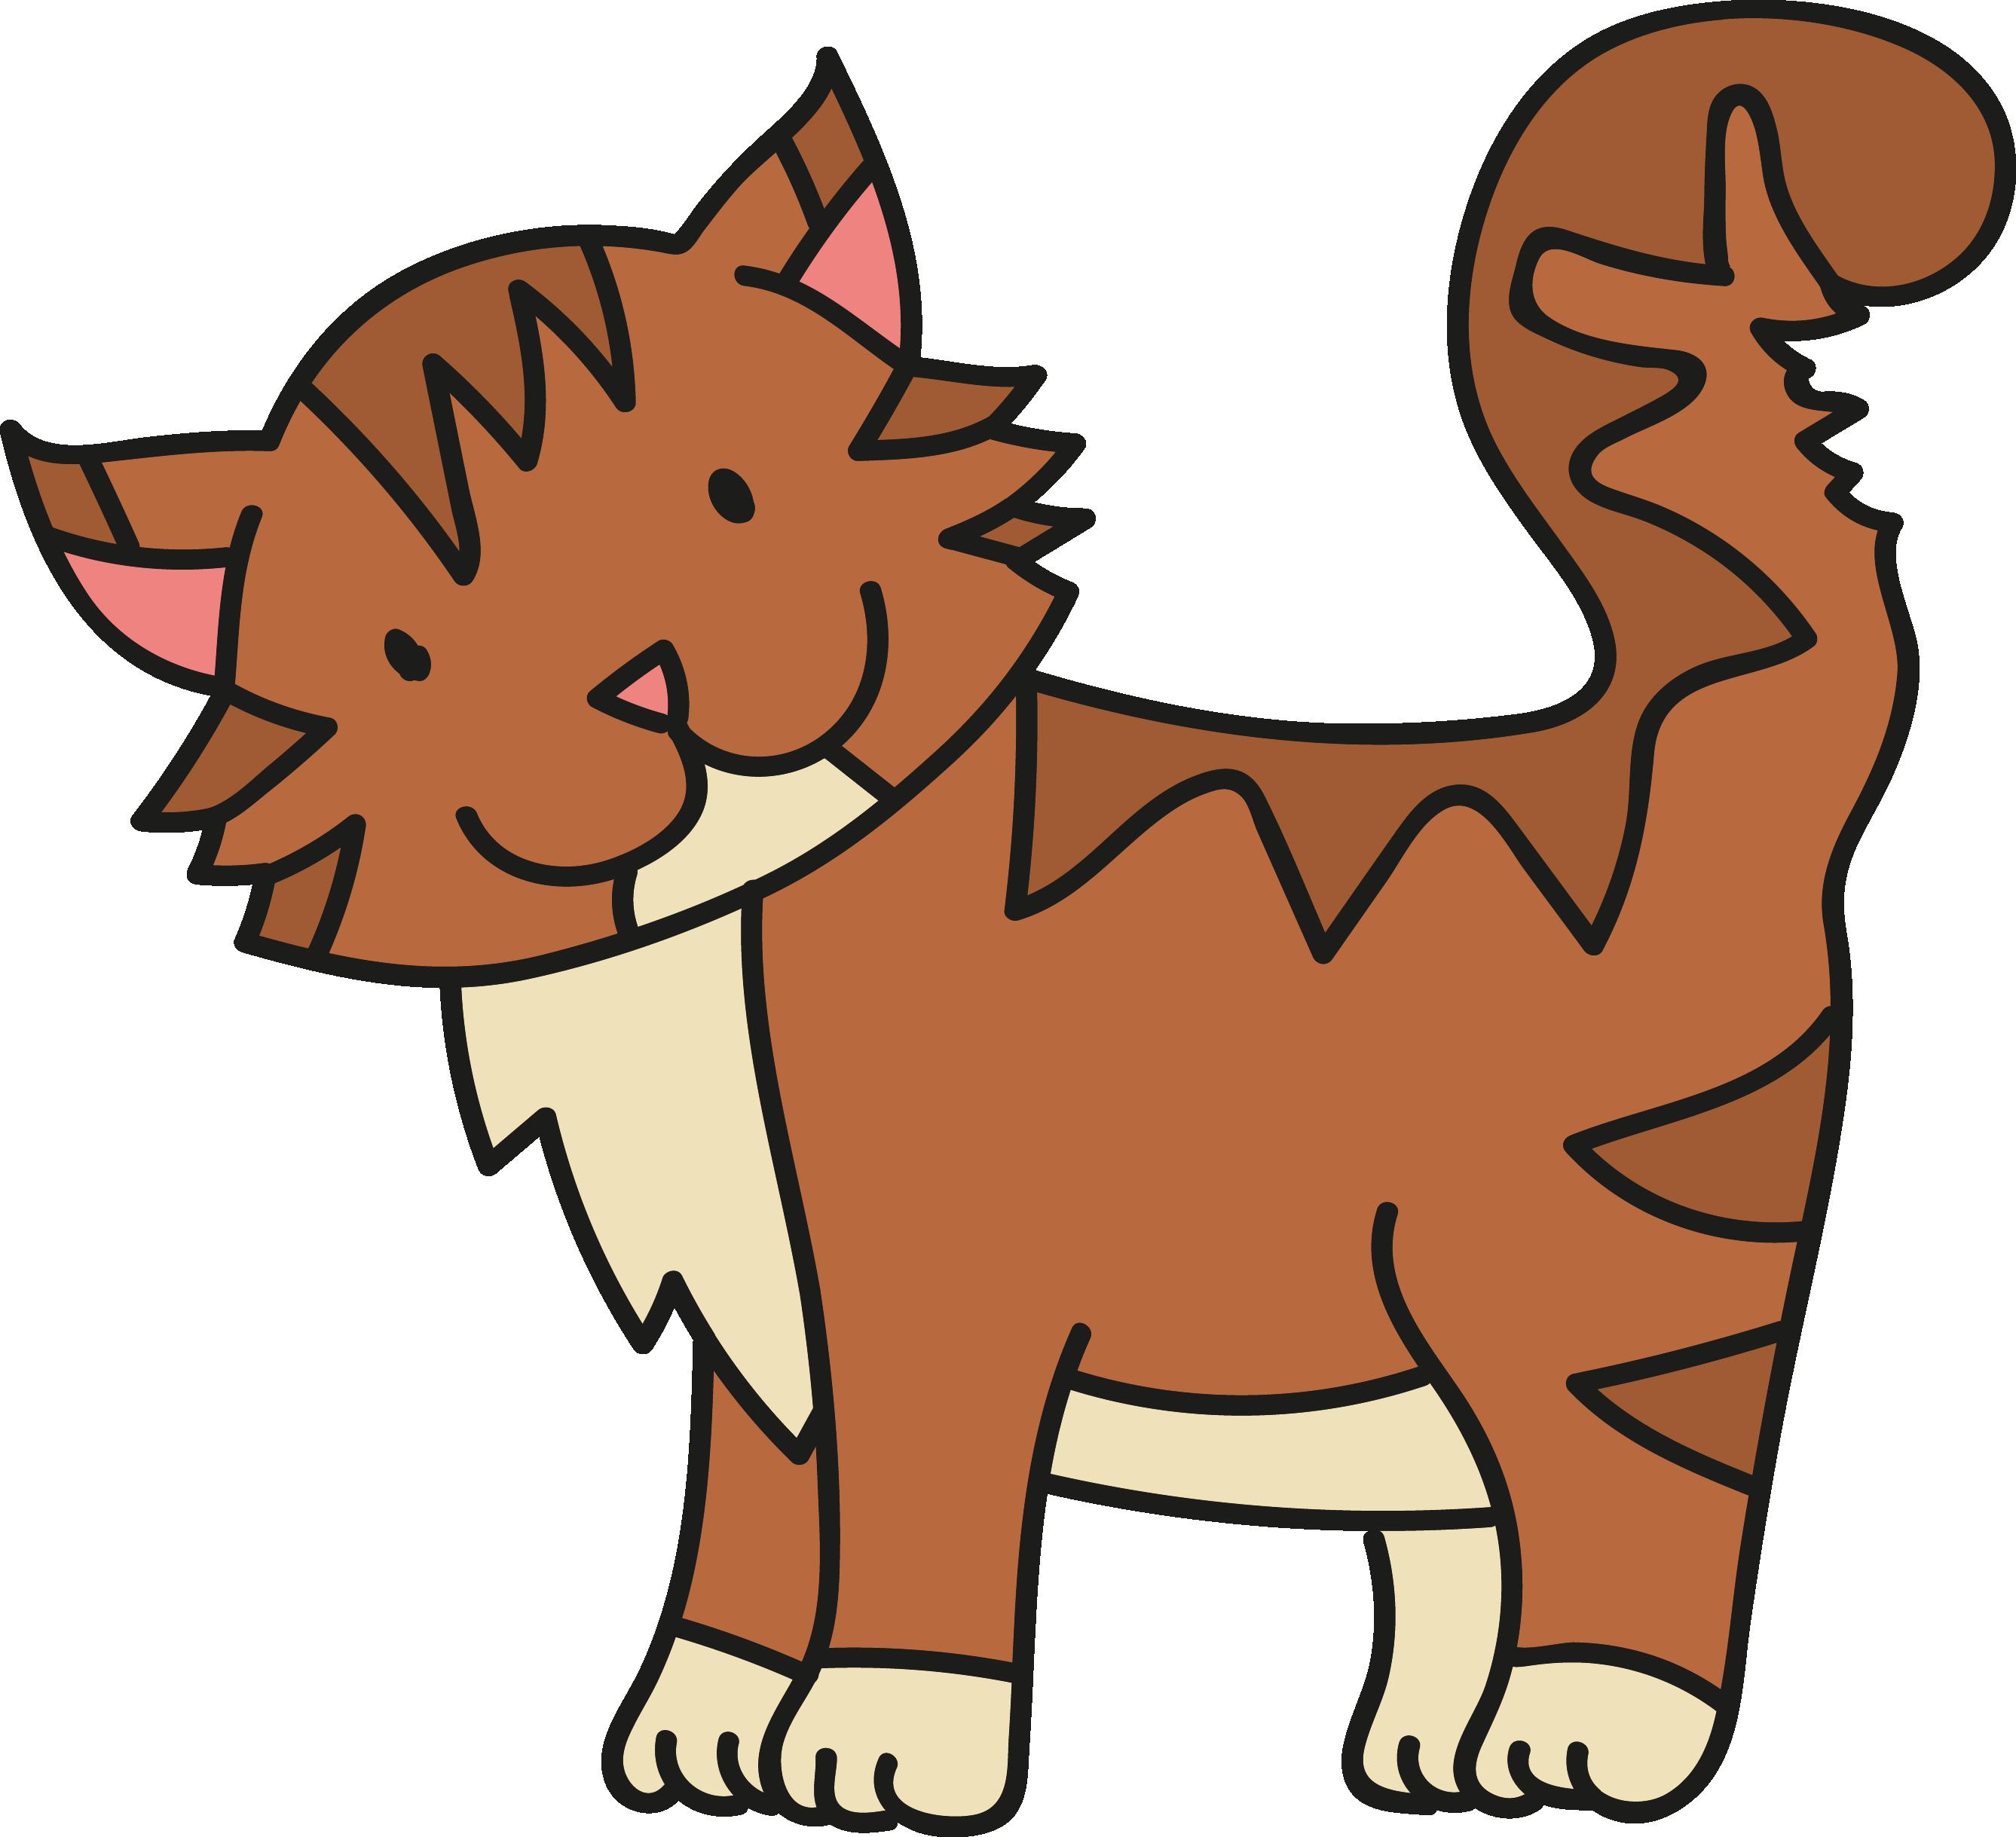 Wildcat clipart wild cat. American bobtail kitten whiskers